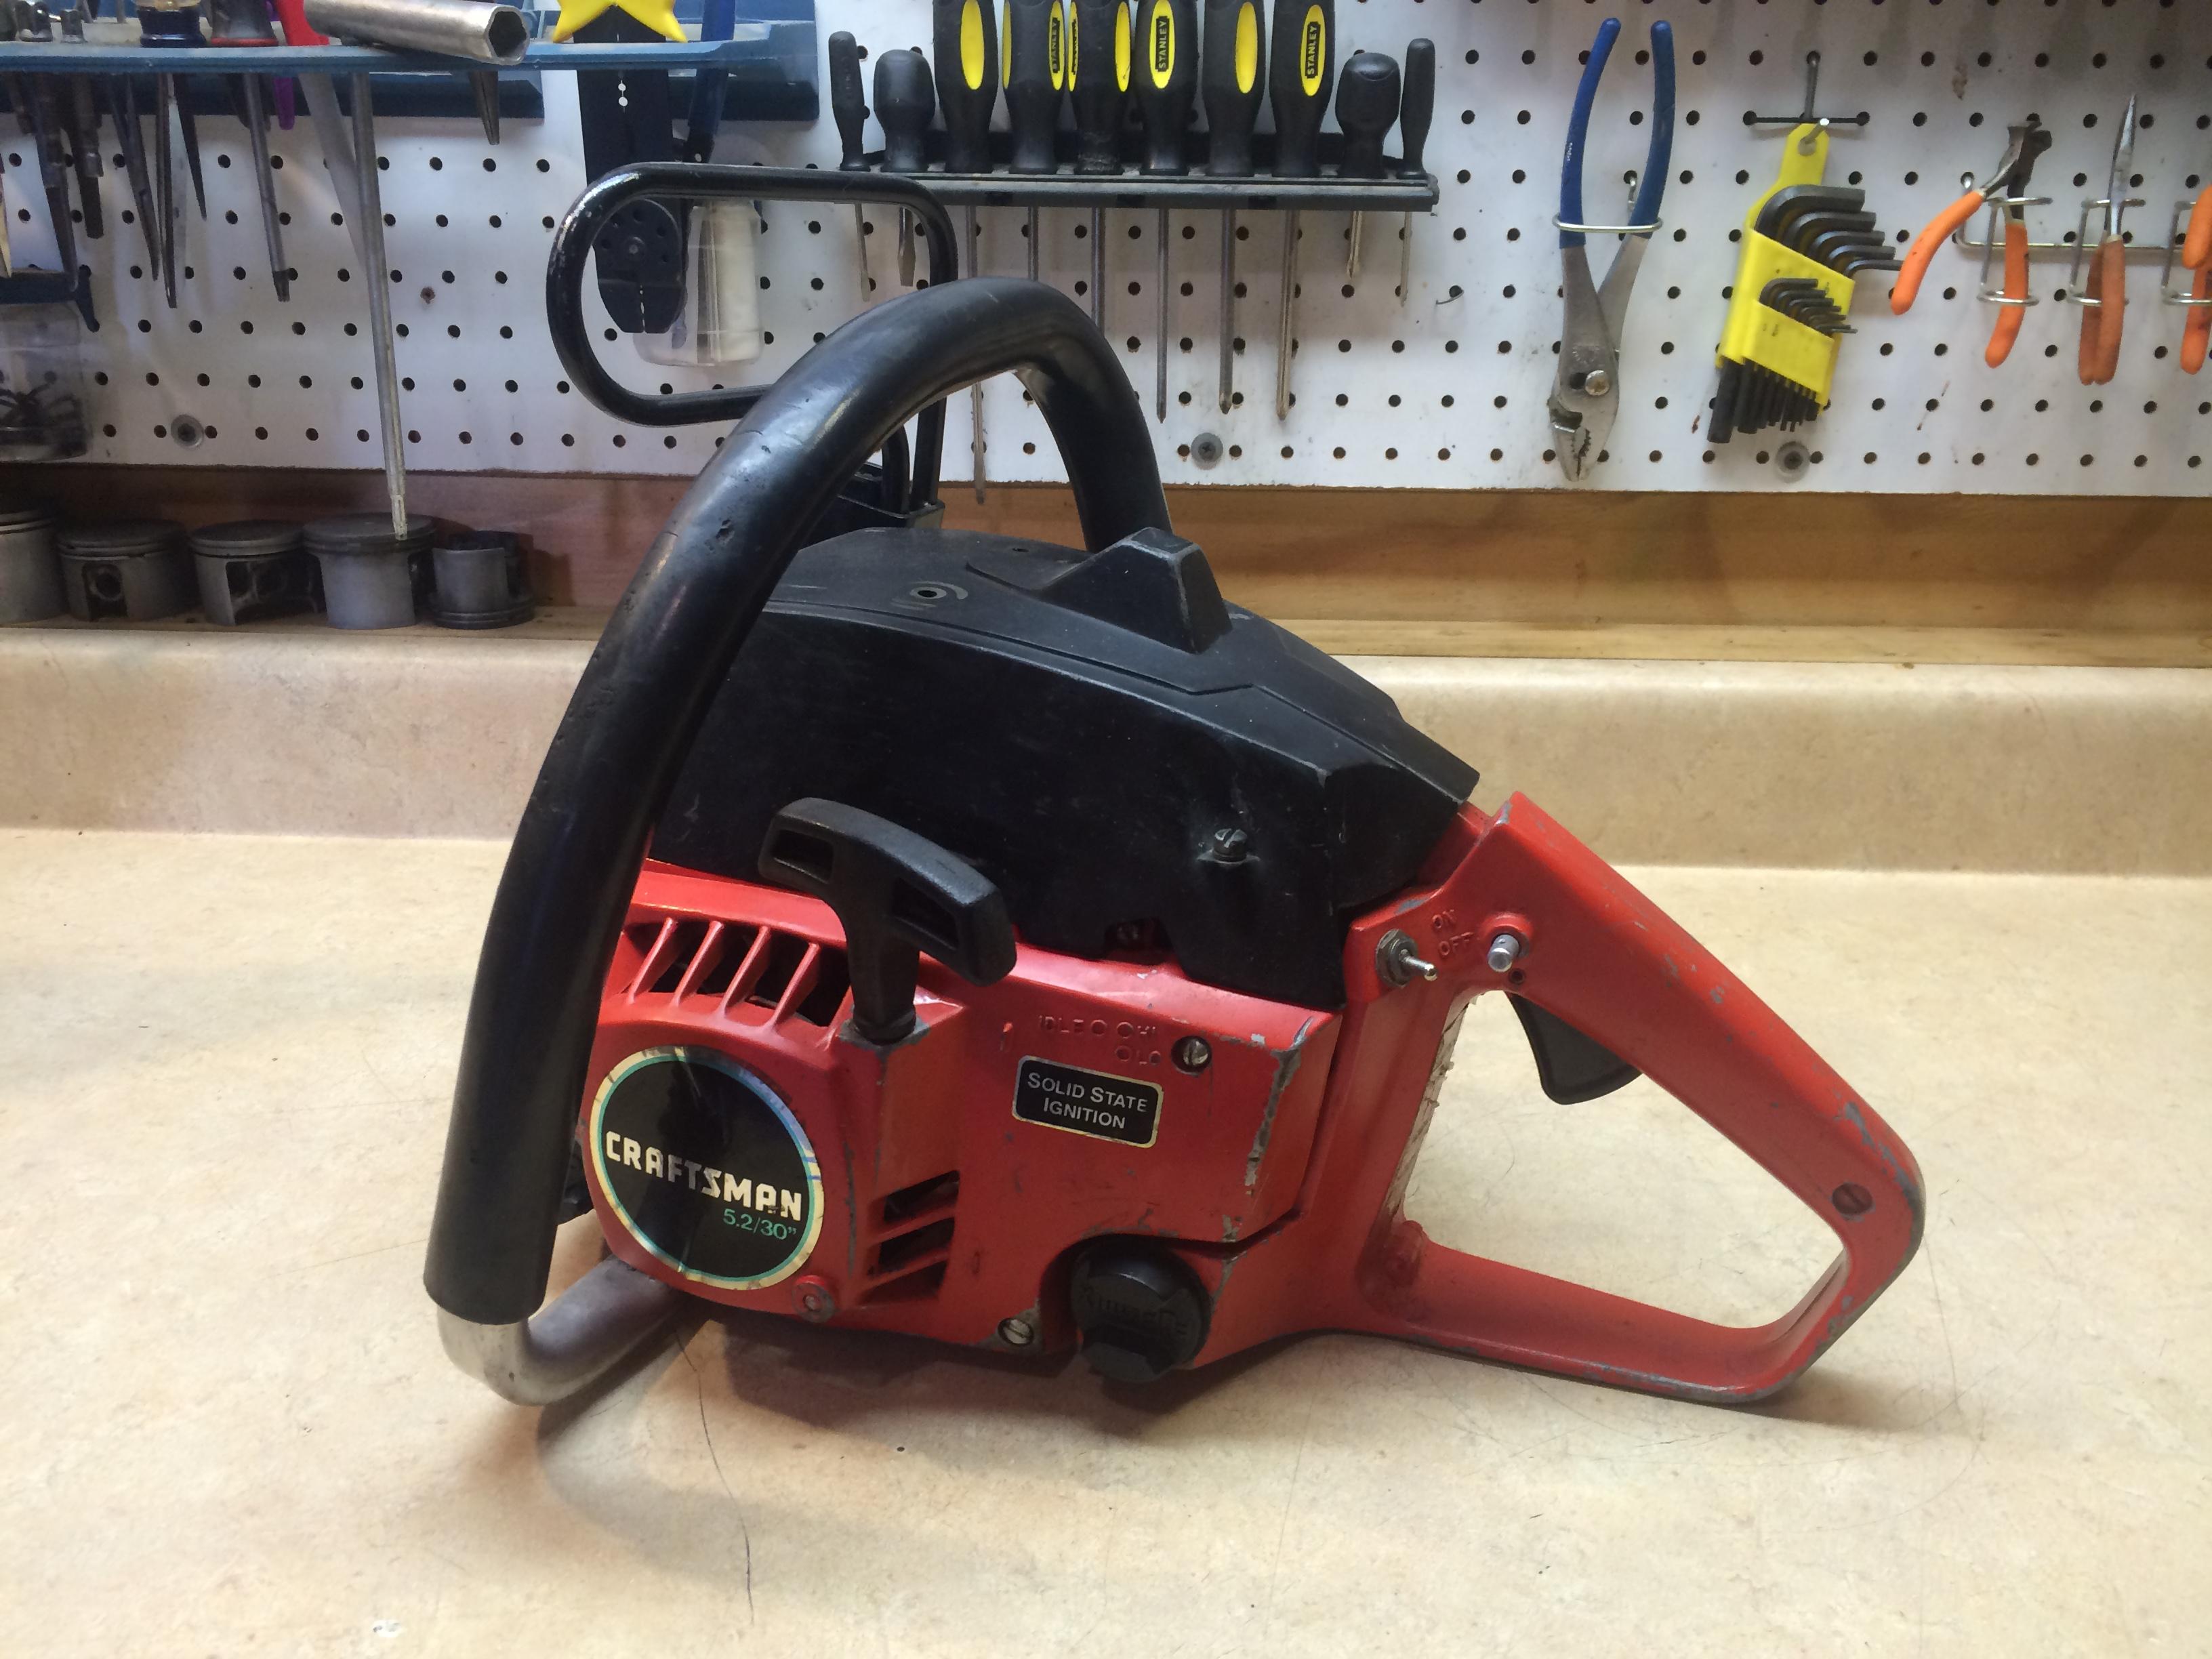 Craftsman 5.2 (Poulan 5200) chainsaw